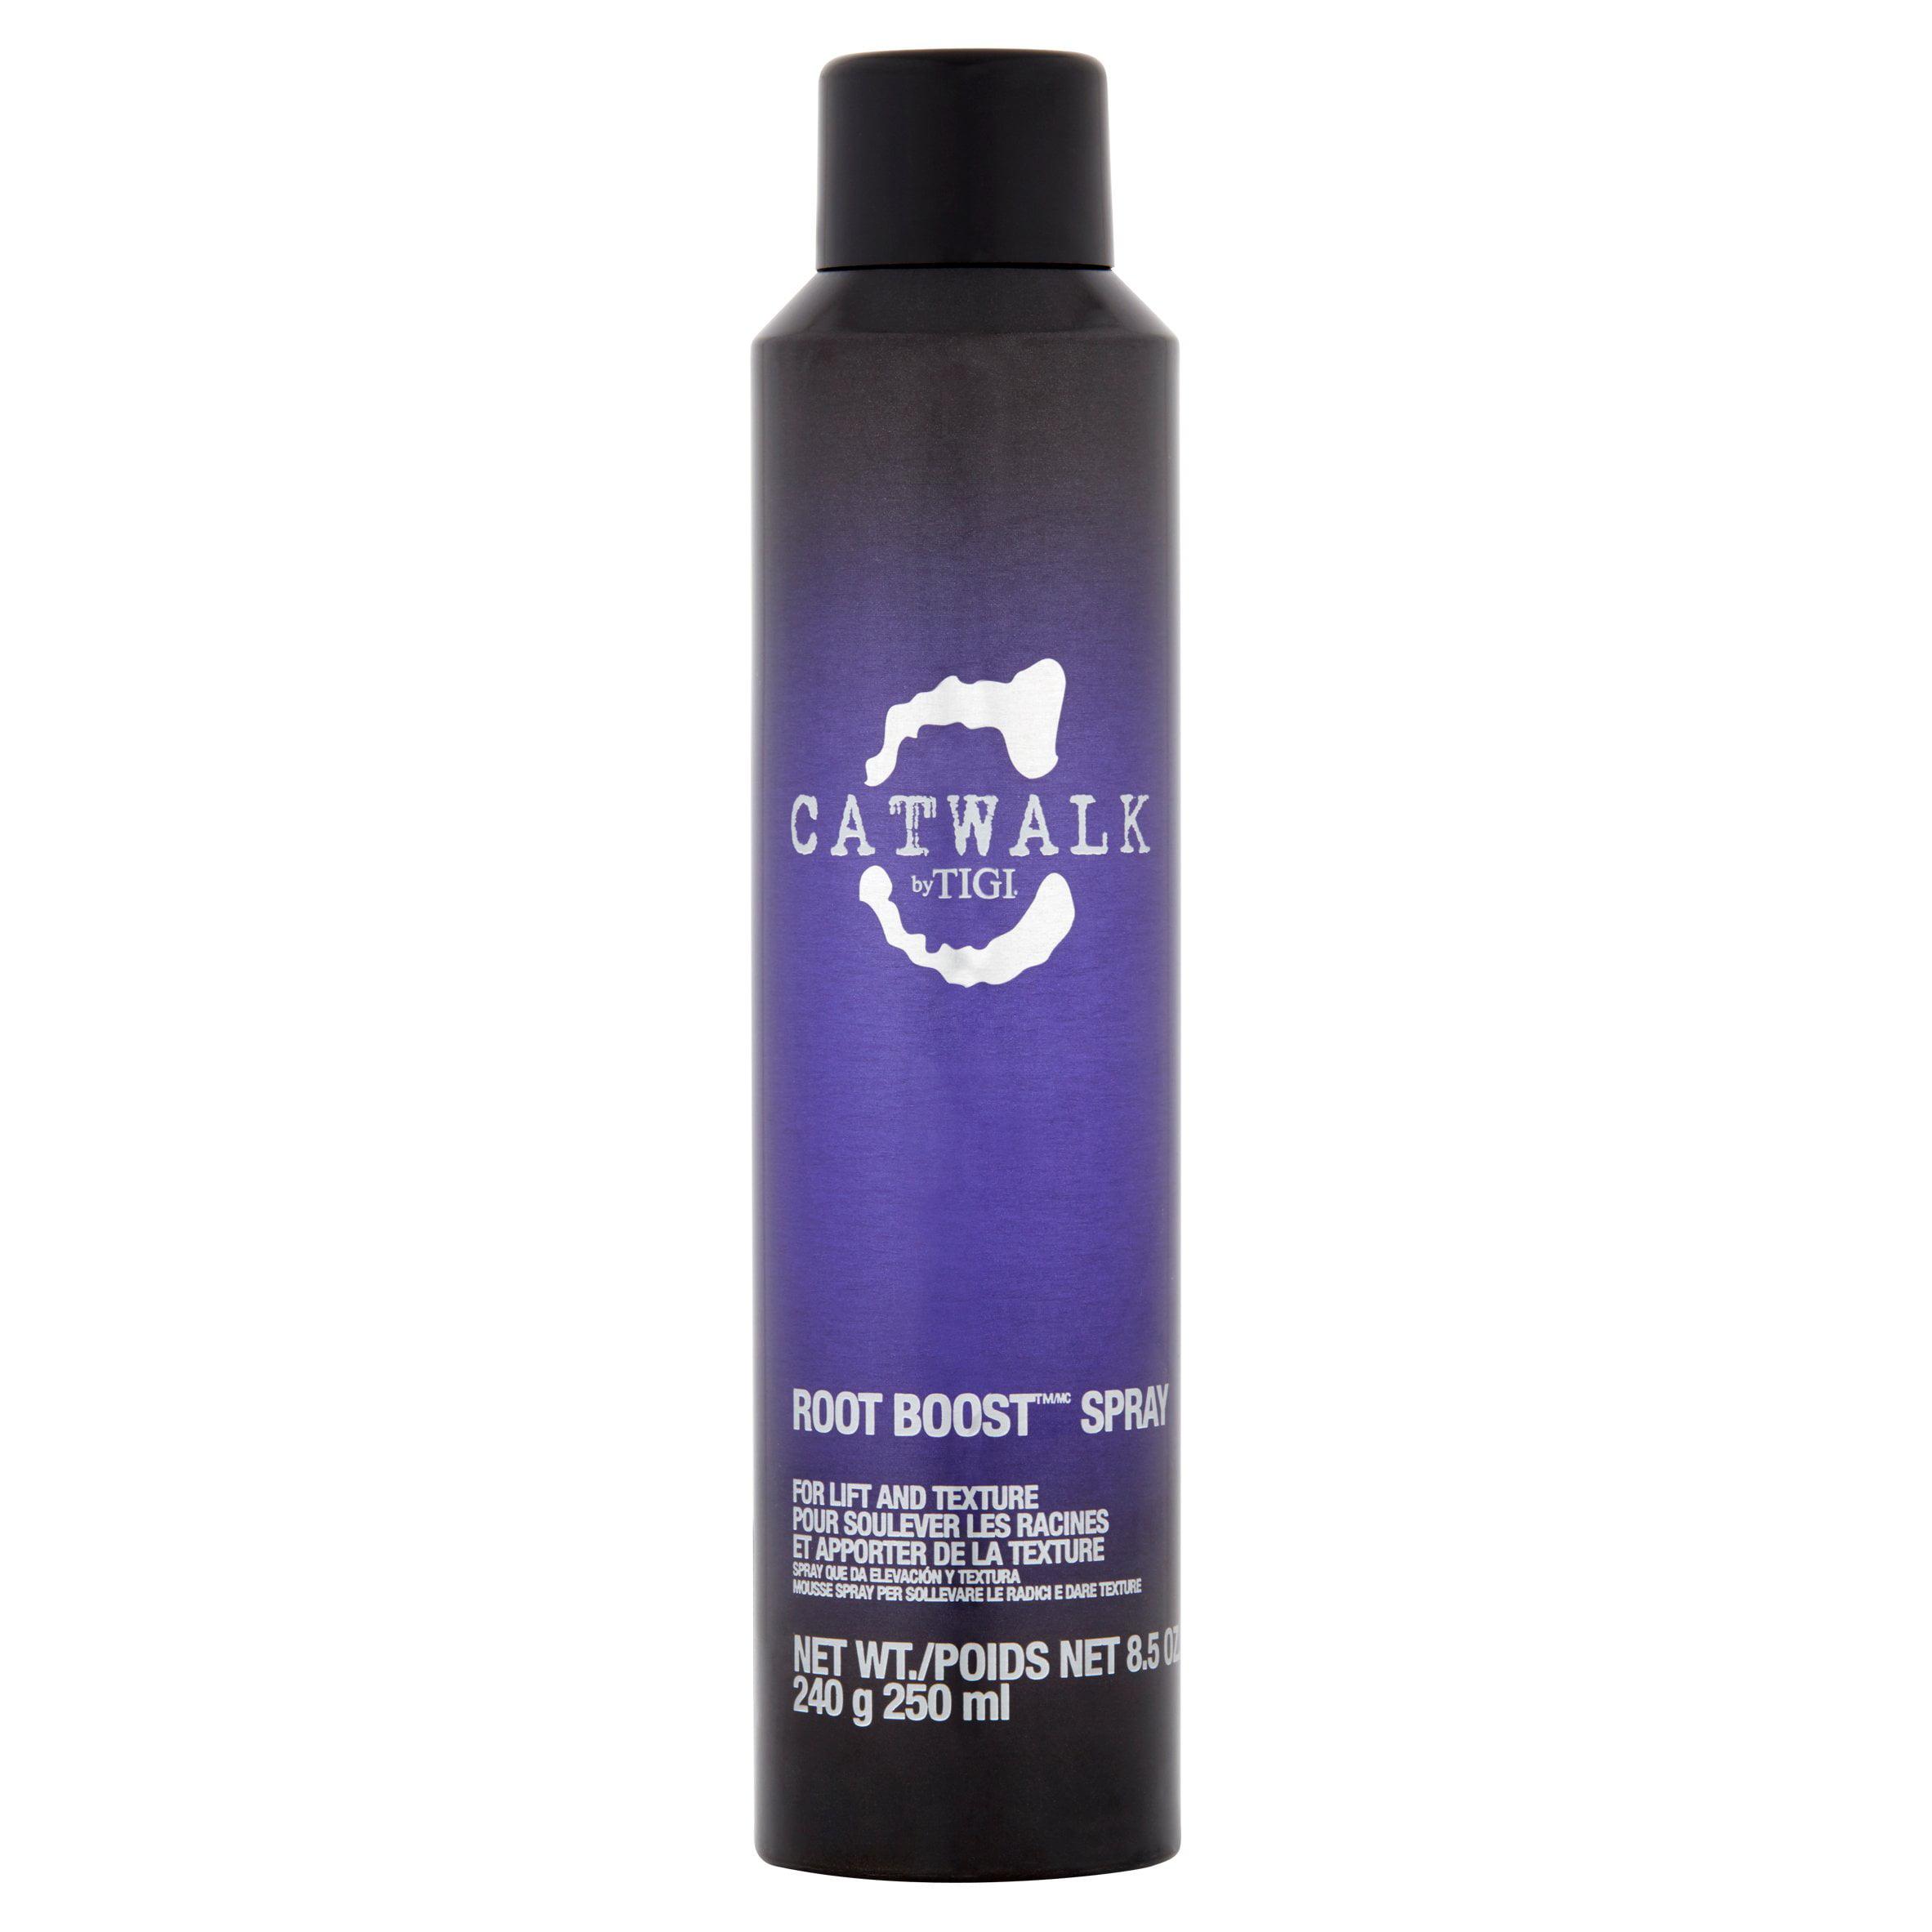 Tigi Catwalk Your Highness Root Boost Spray, 8.5 oz